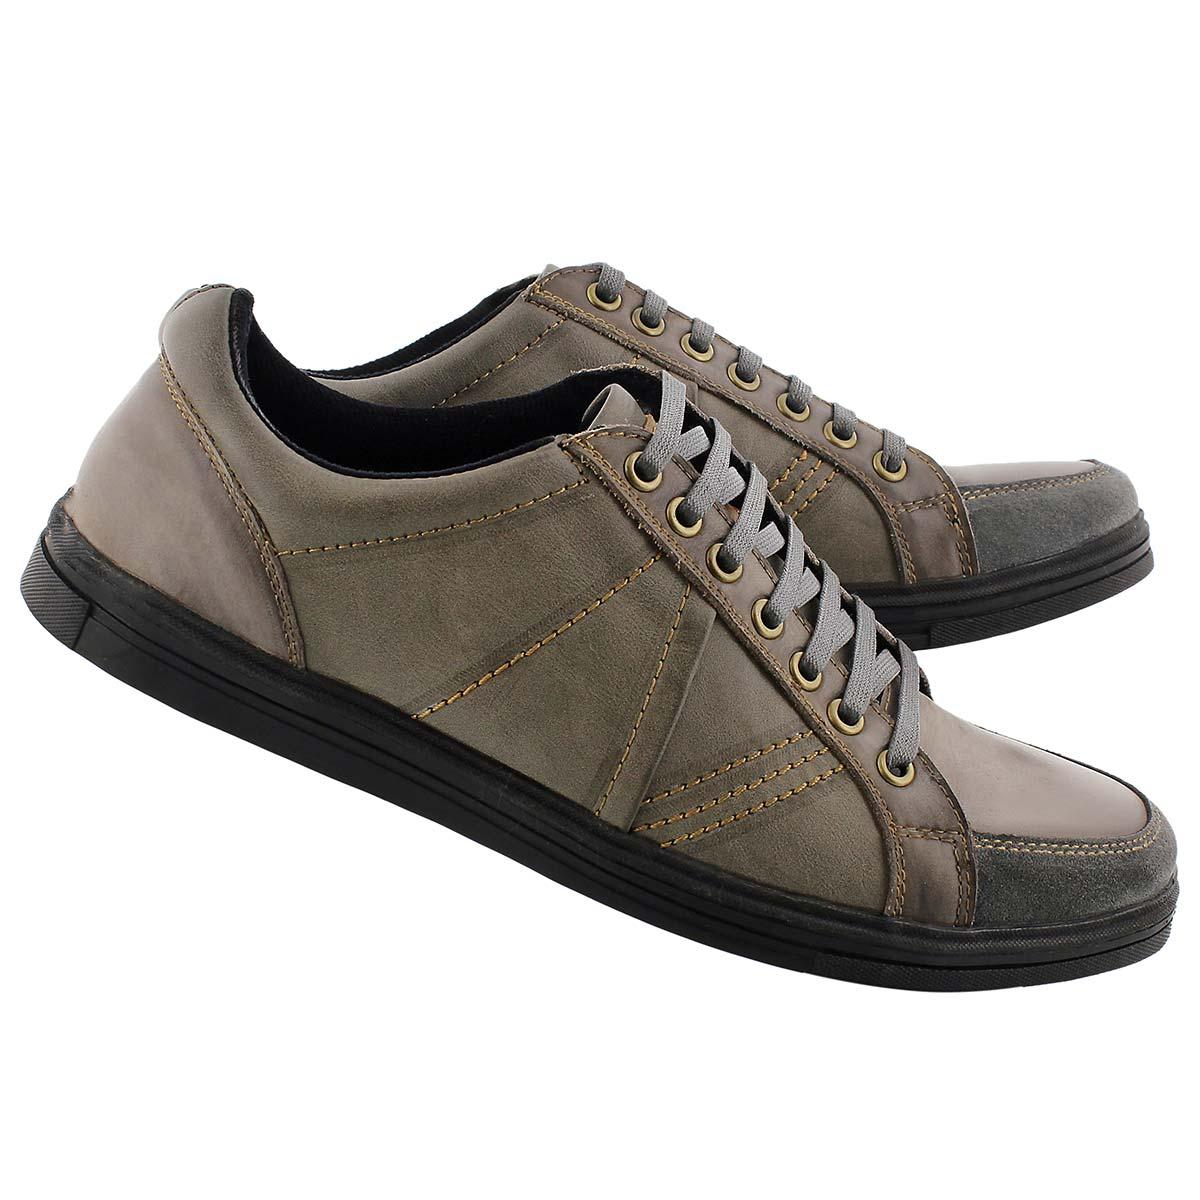 Mns Vagabond grey/ blk leather sneaker